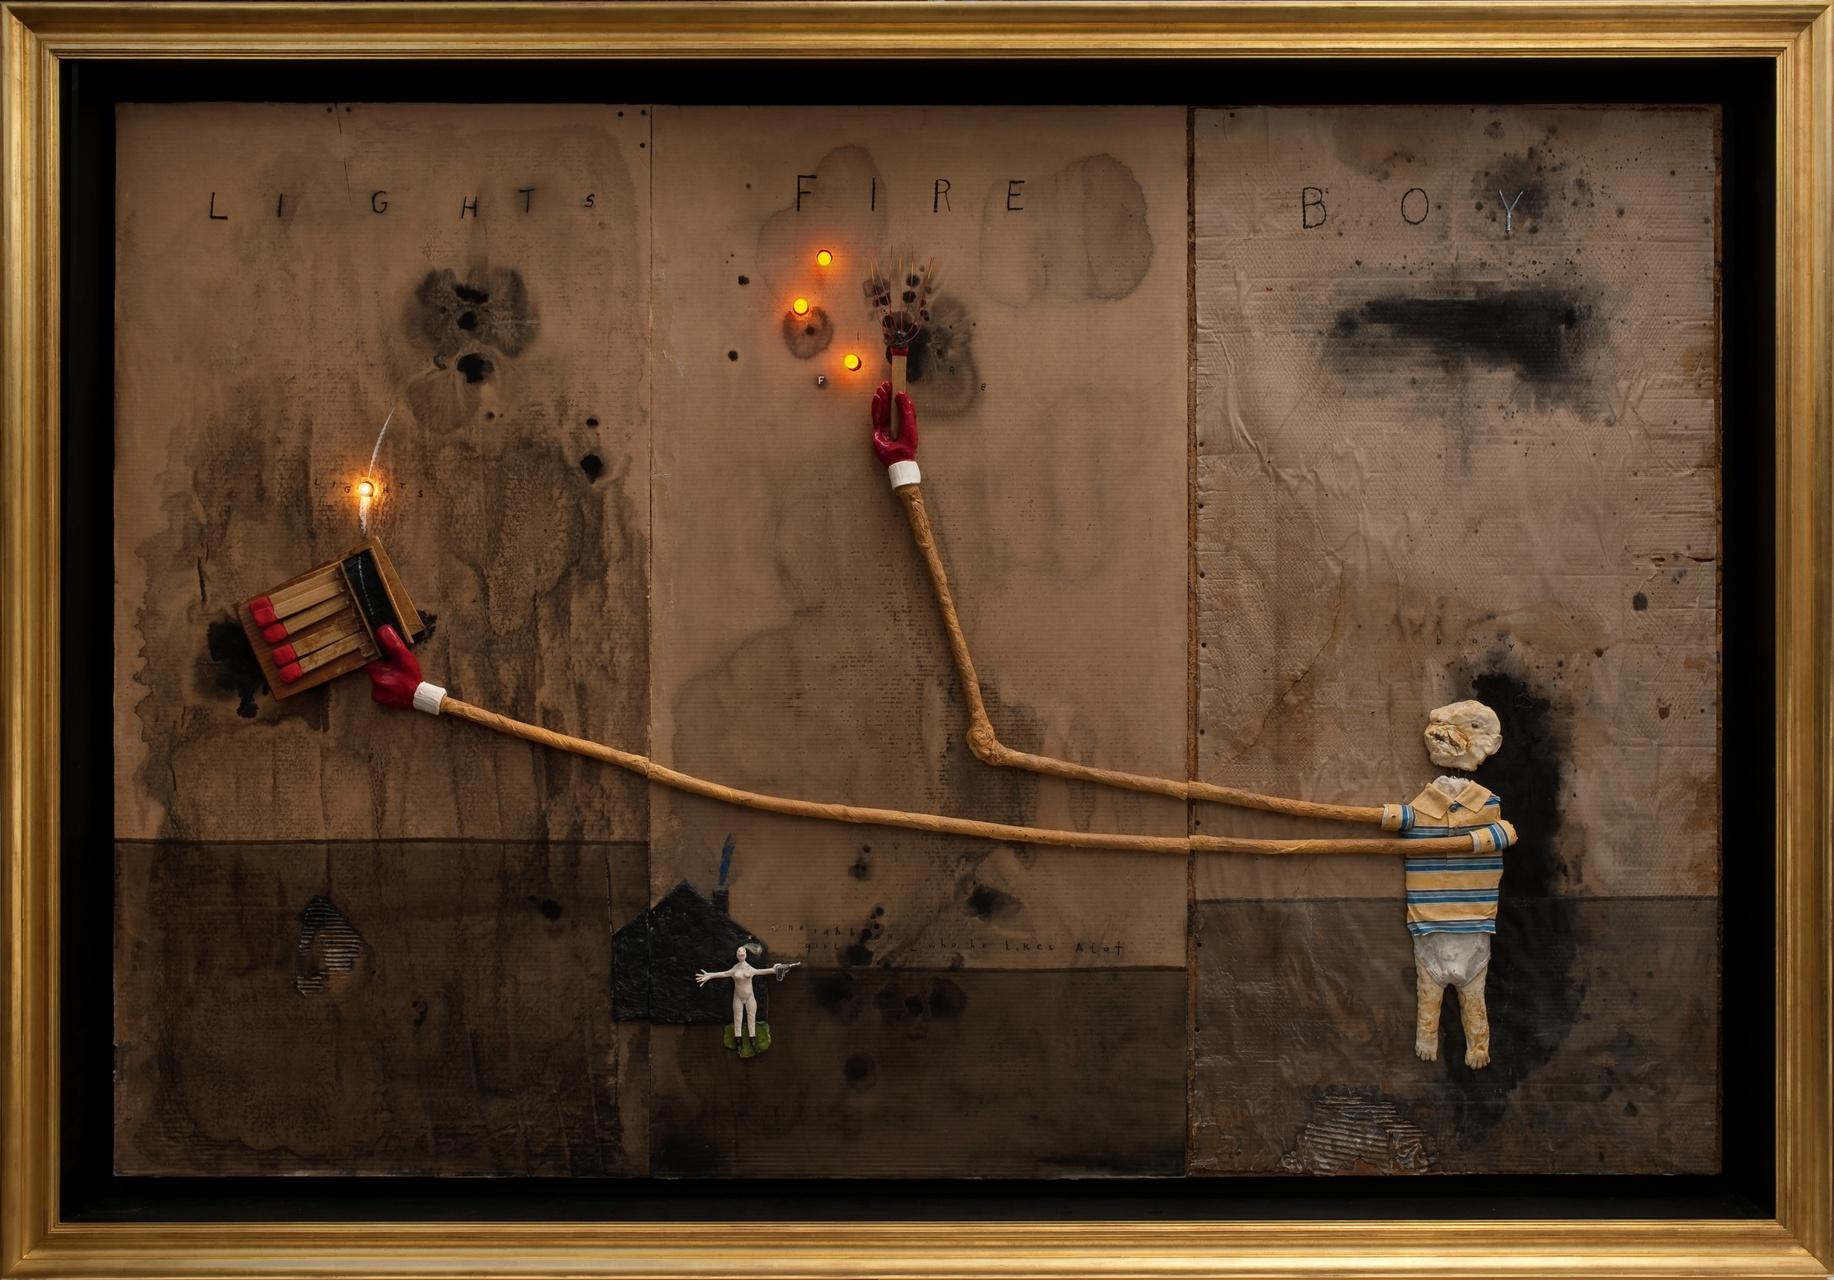 David Lynch, Boy Lights Fire, 2010, mixed media on cardboard, courtesy the artist. Collection Bonnefantenmuseum